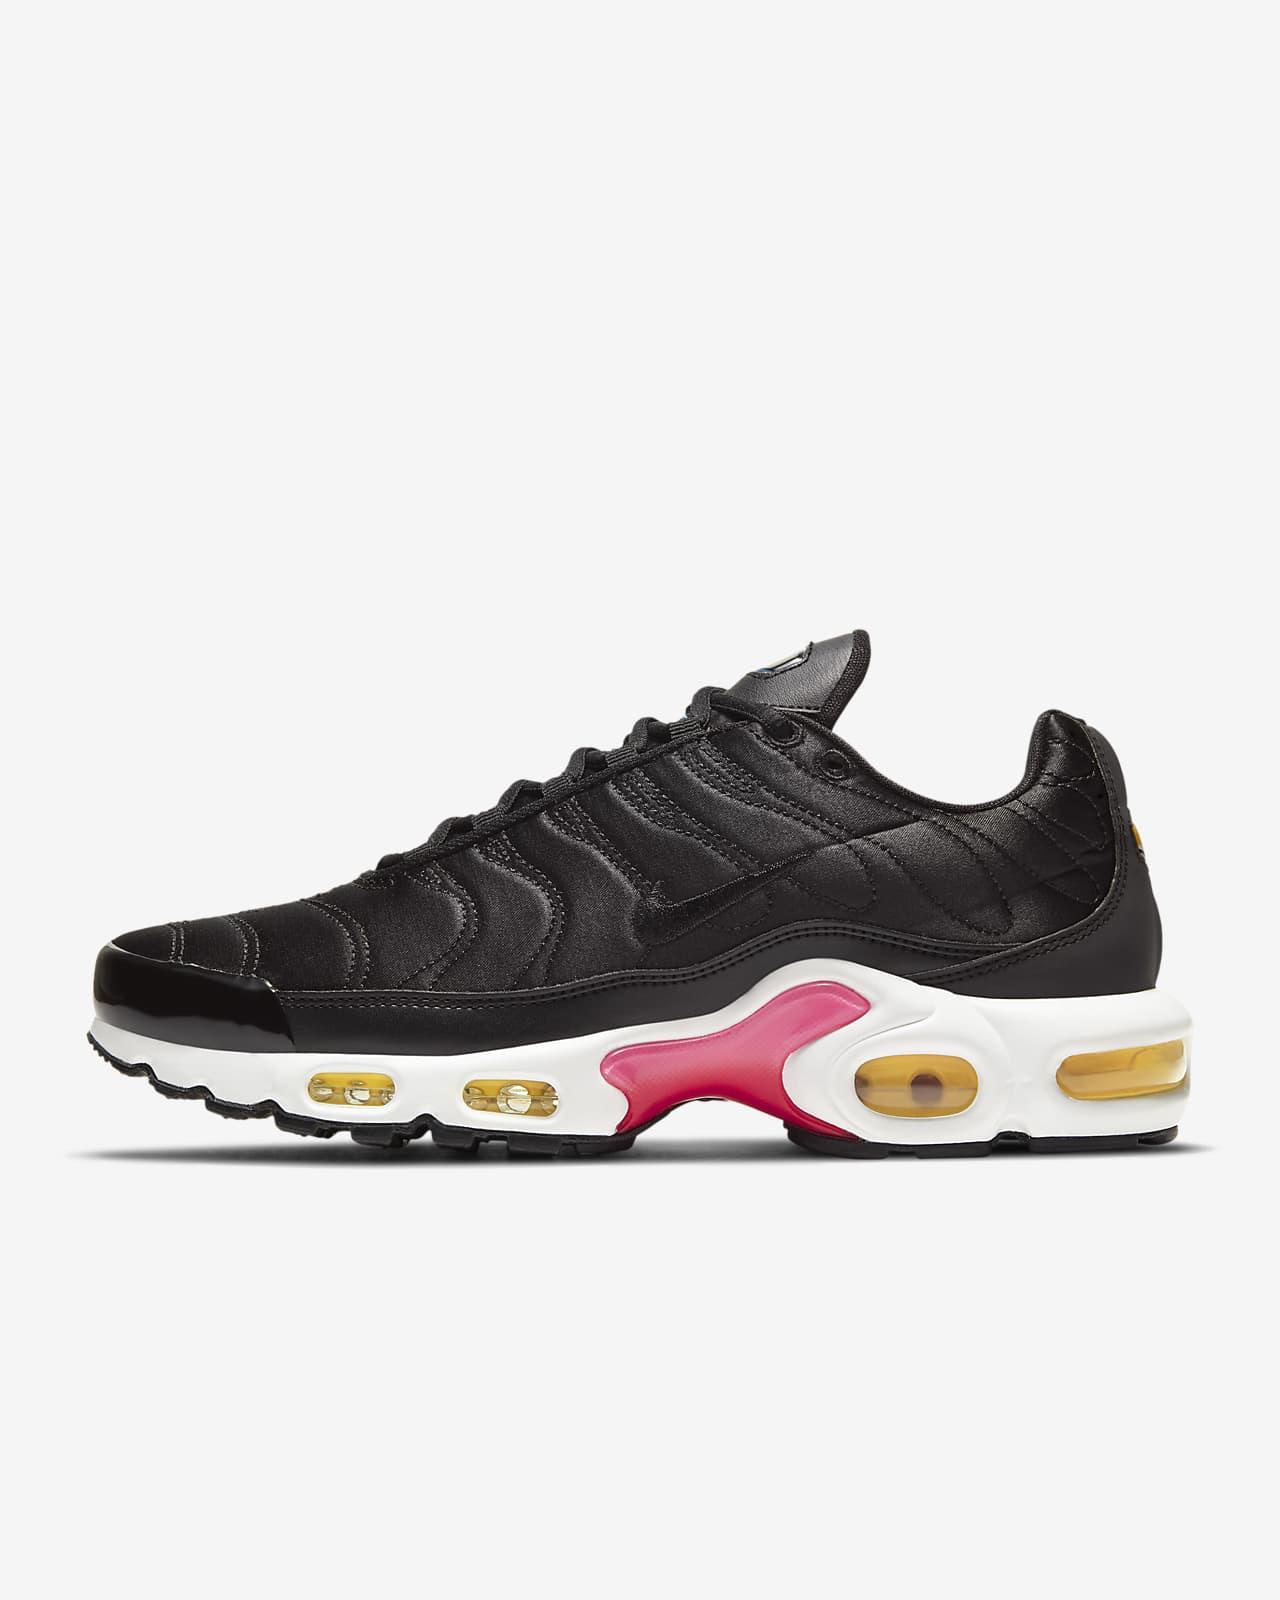 airmax chaussures nike